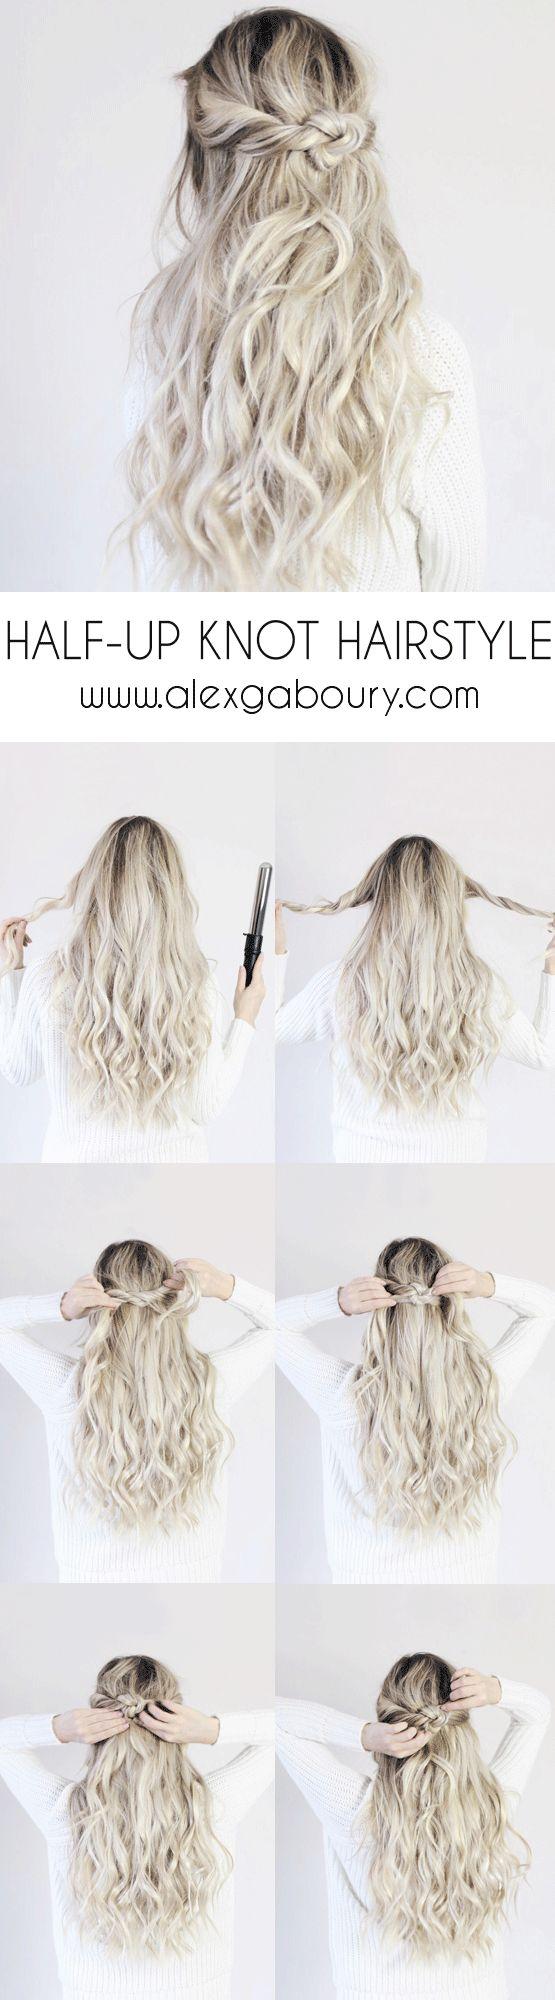 Hair Tutorials Half Up Knot Hairstyle Halfup Knot Hairstyle Alex